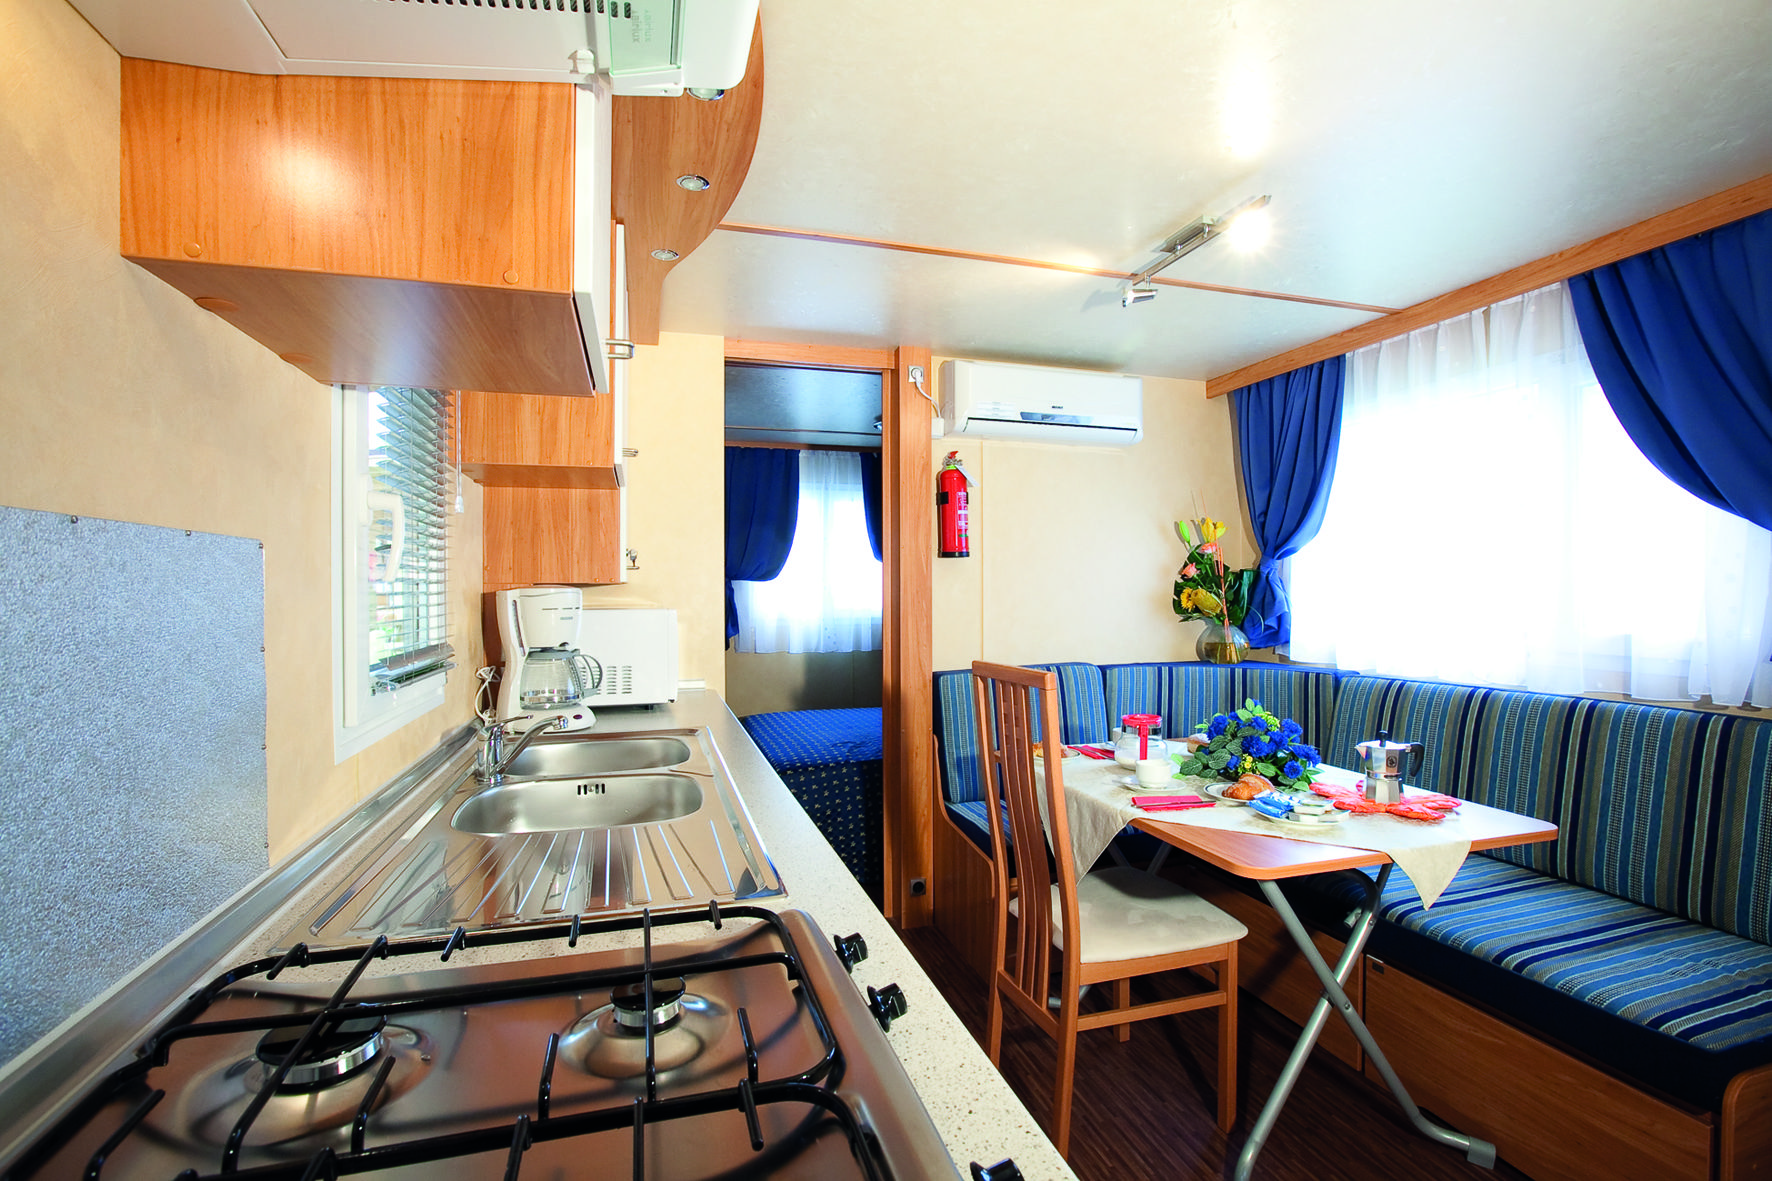 Maxi Caravan Plus more info http//bit.ly/pin_caravan_EN